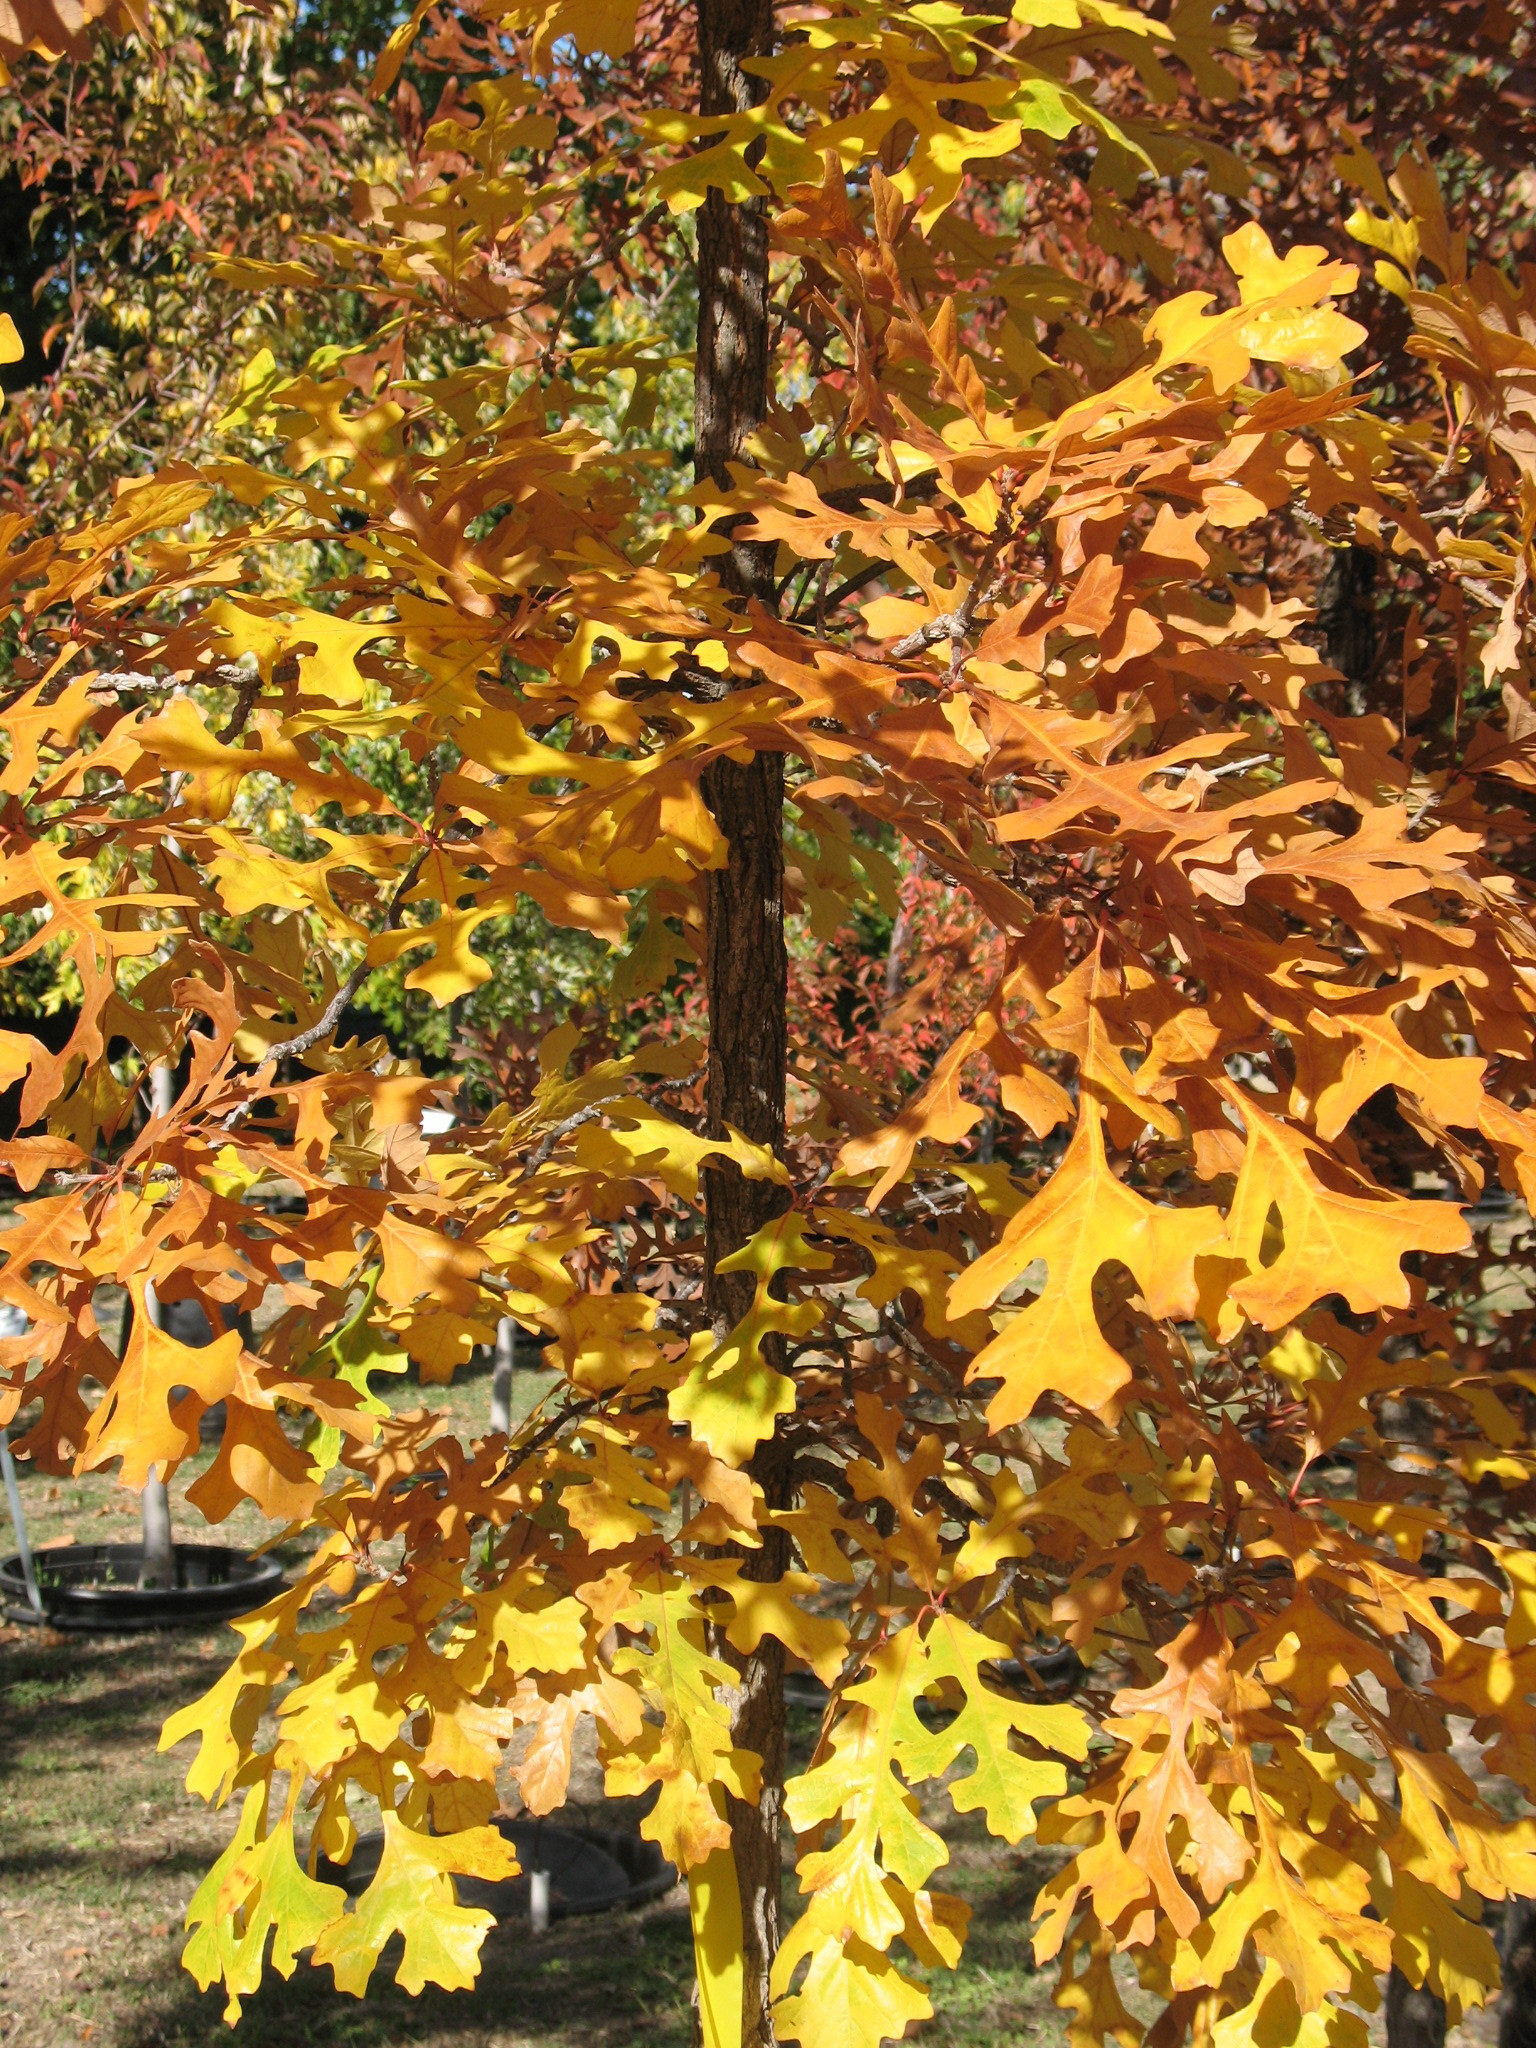 Leaves of a Bur Oak